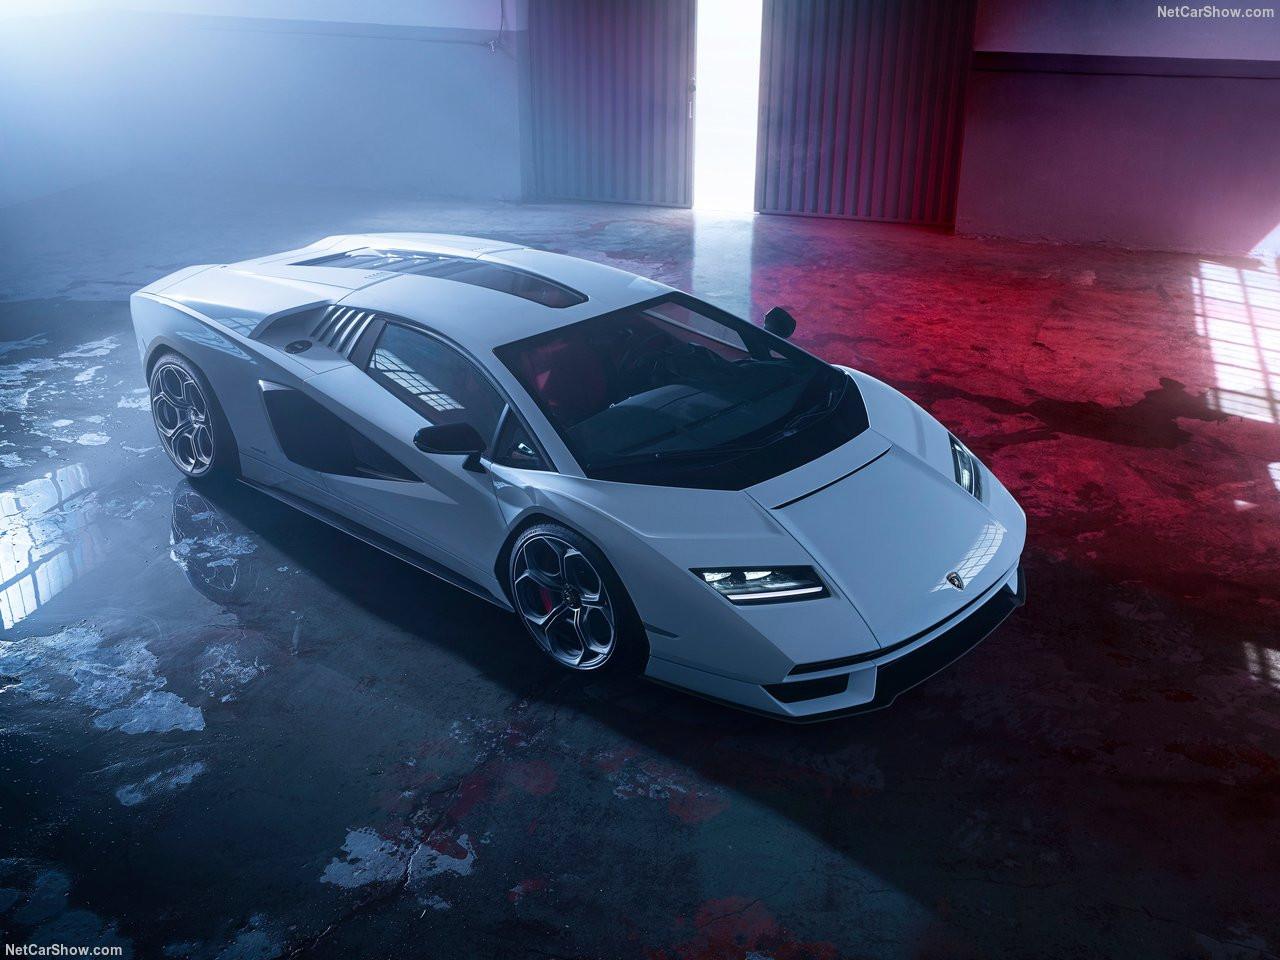 Lamborghini-Countach_LPI_800-4-2022-1280-01.jpg